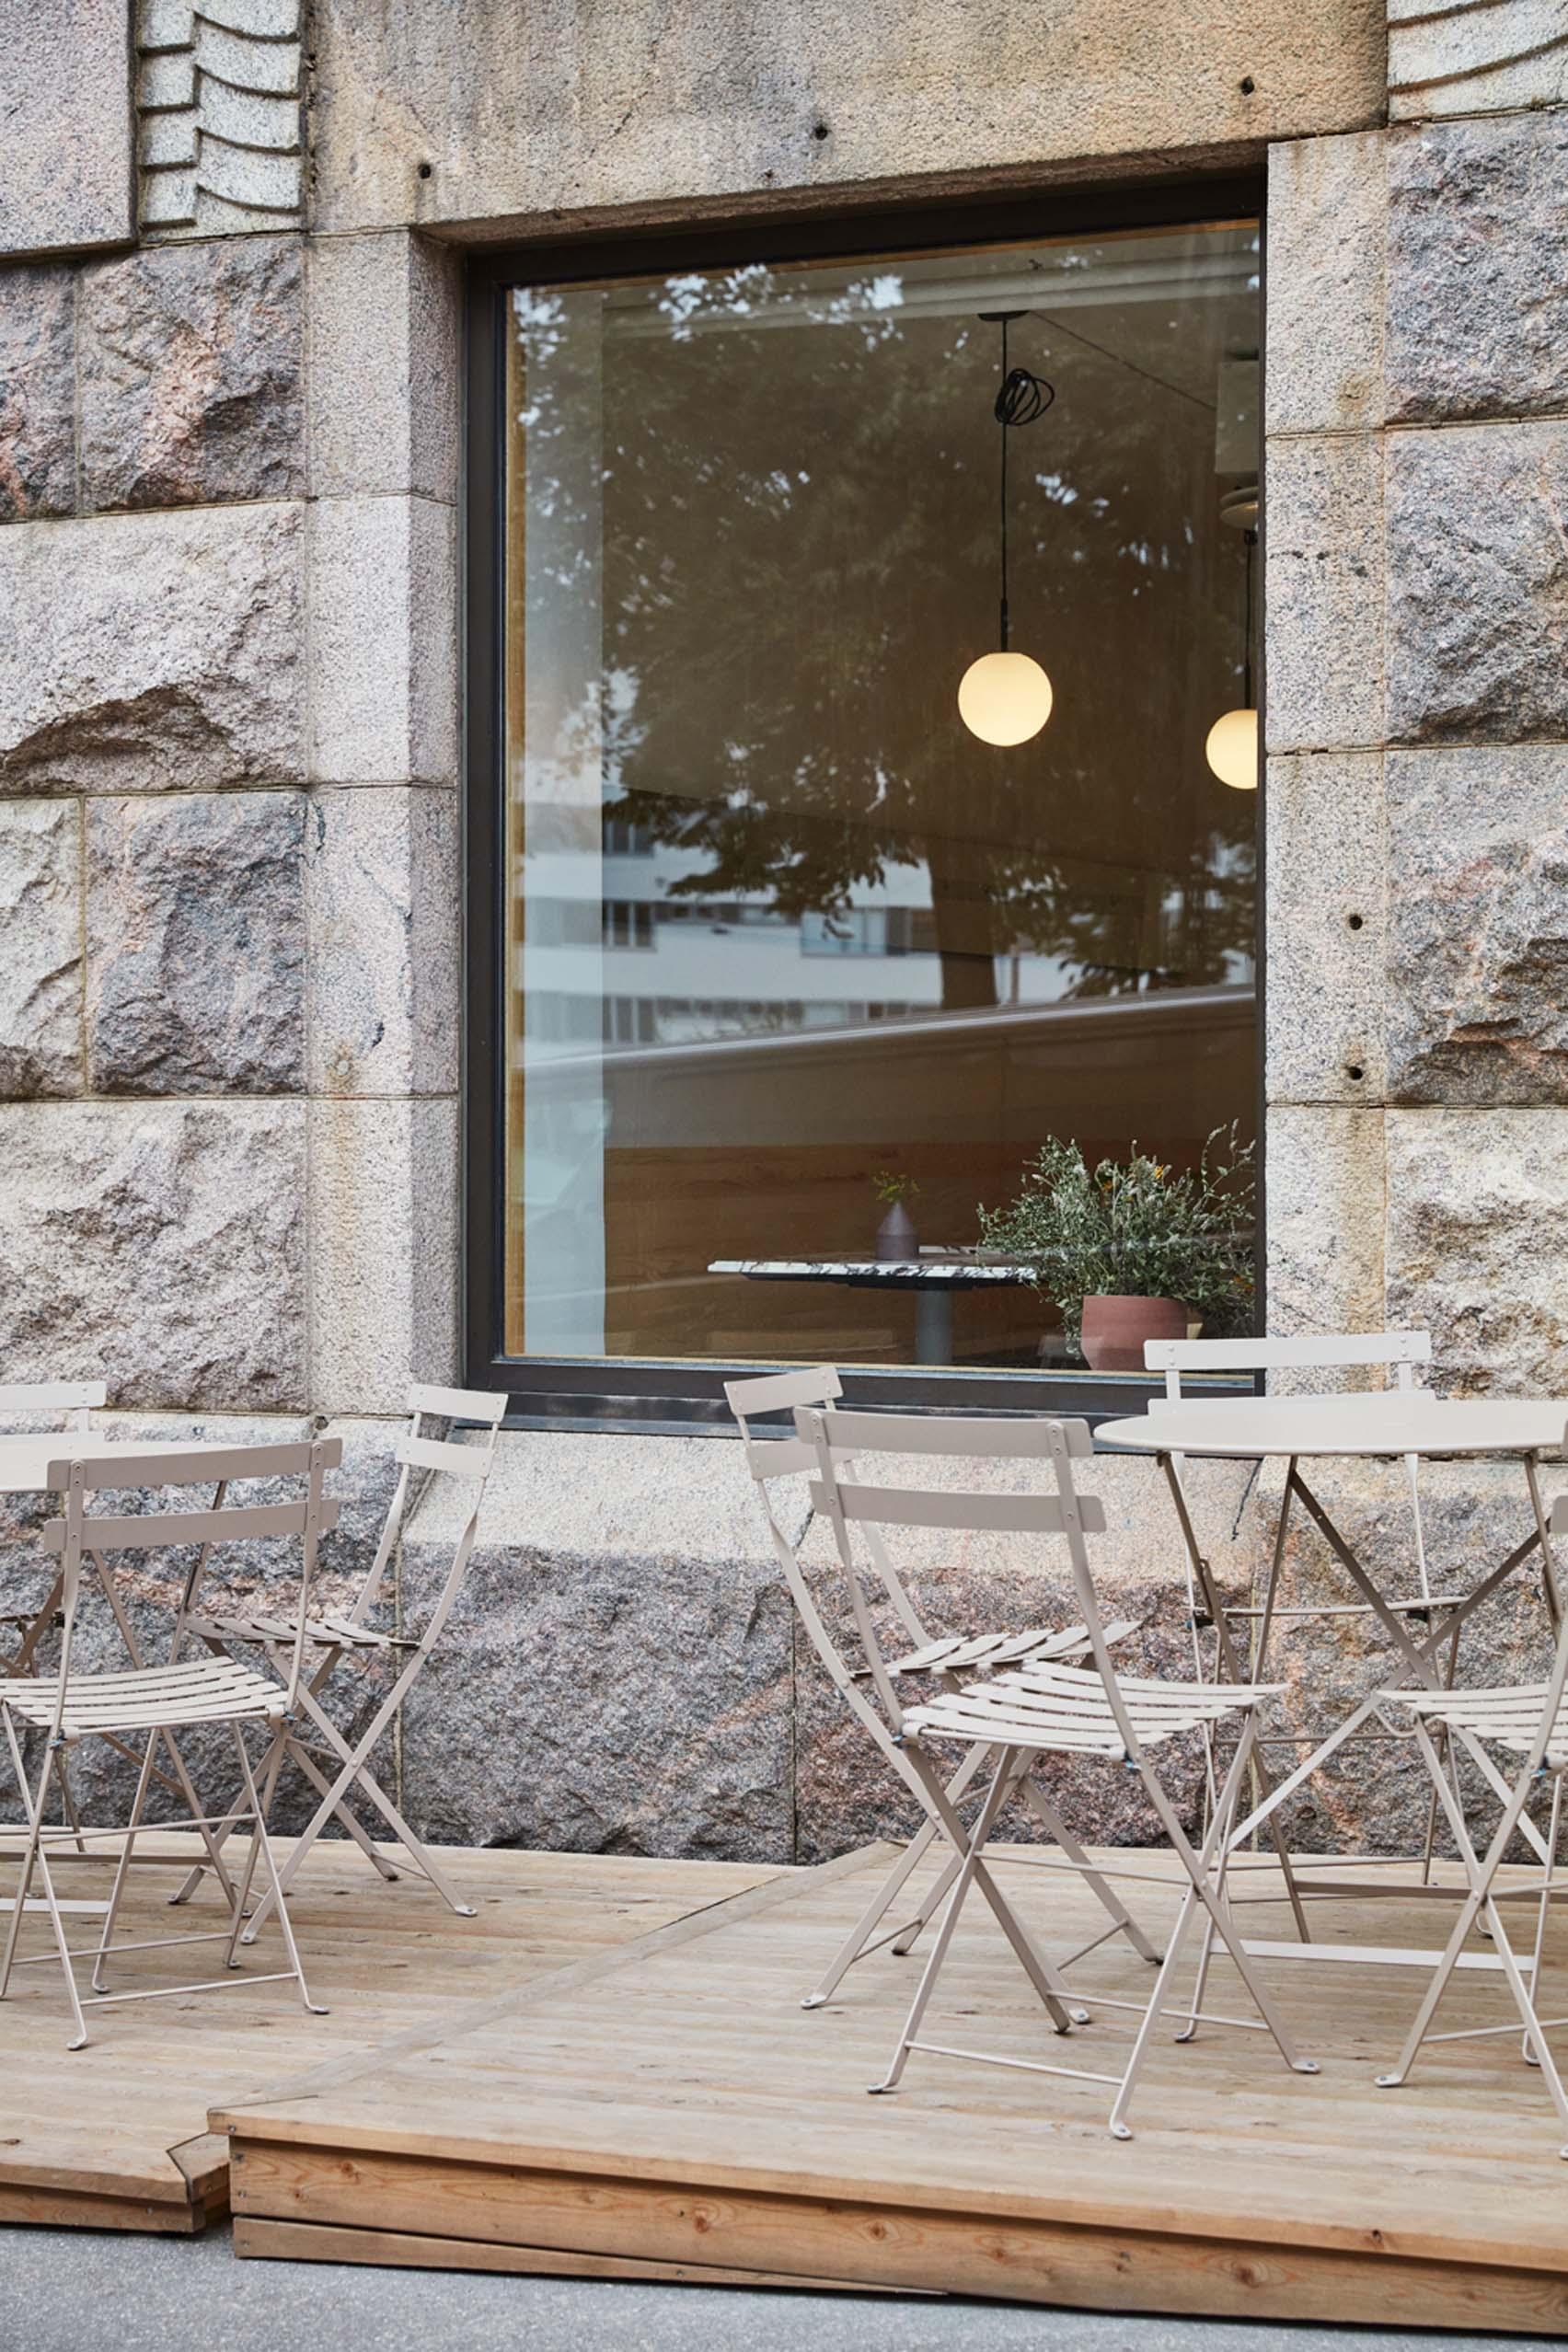 WAY bakery and wine bar in Helsinki by Studio Joanna Laajisto